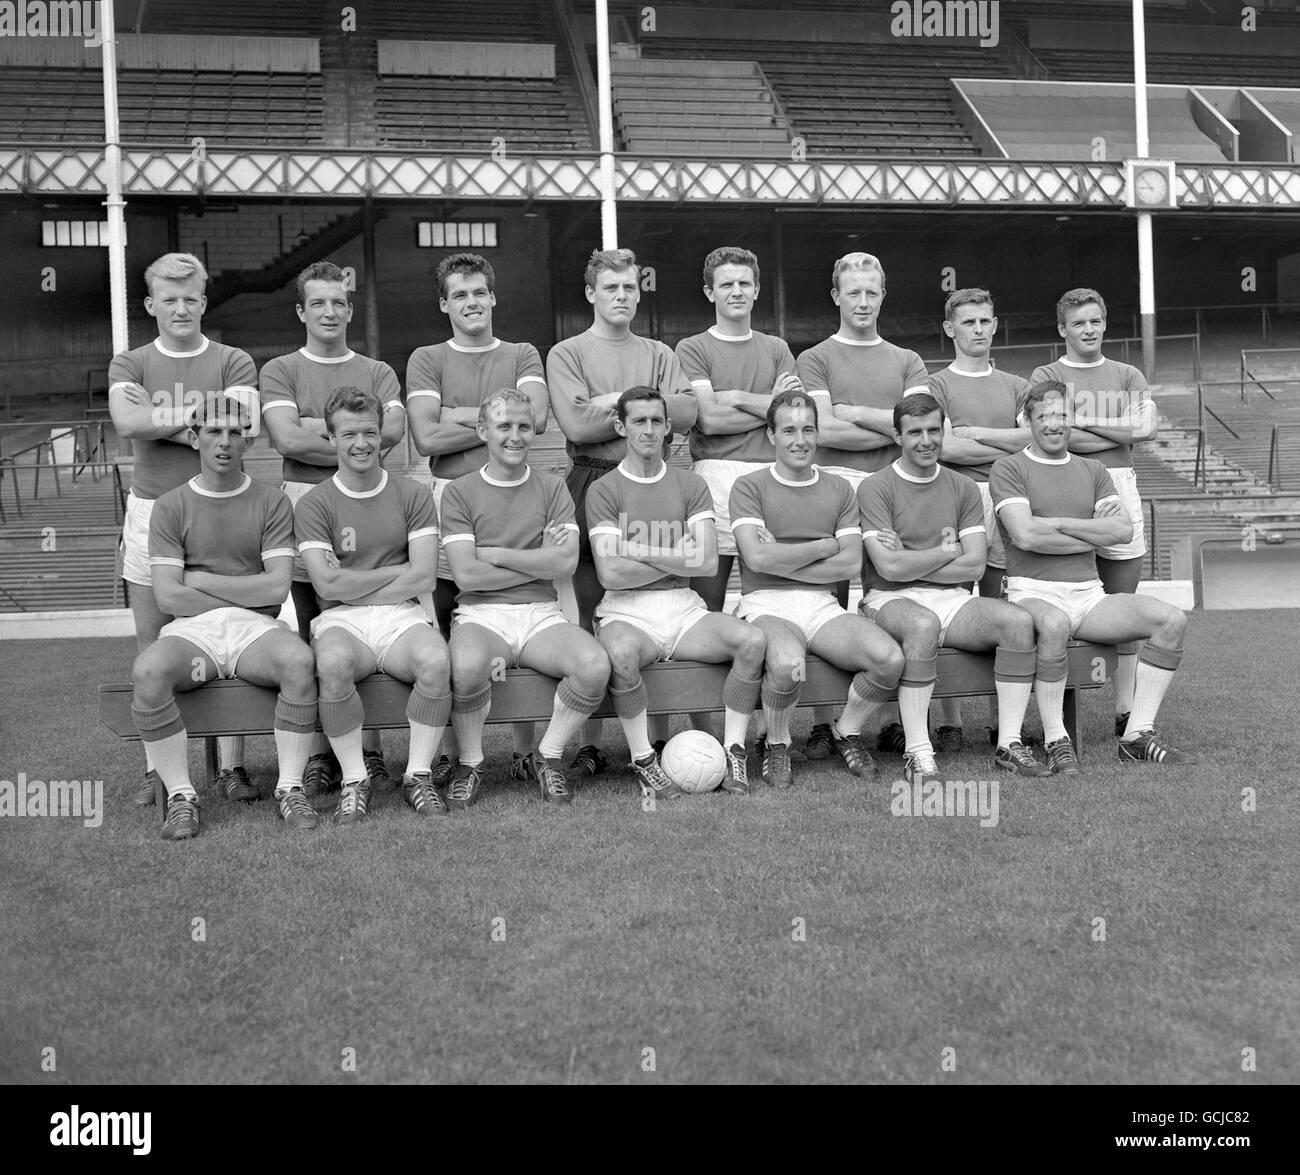 Soccer - League Division One - Everton Team - Goodison Park - 1962 - Stock Image